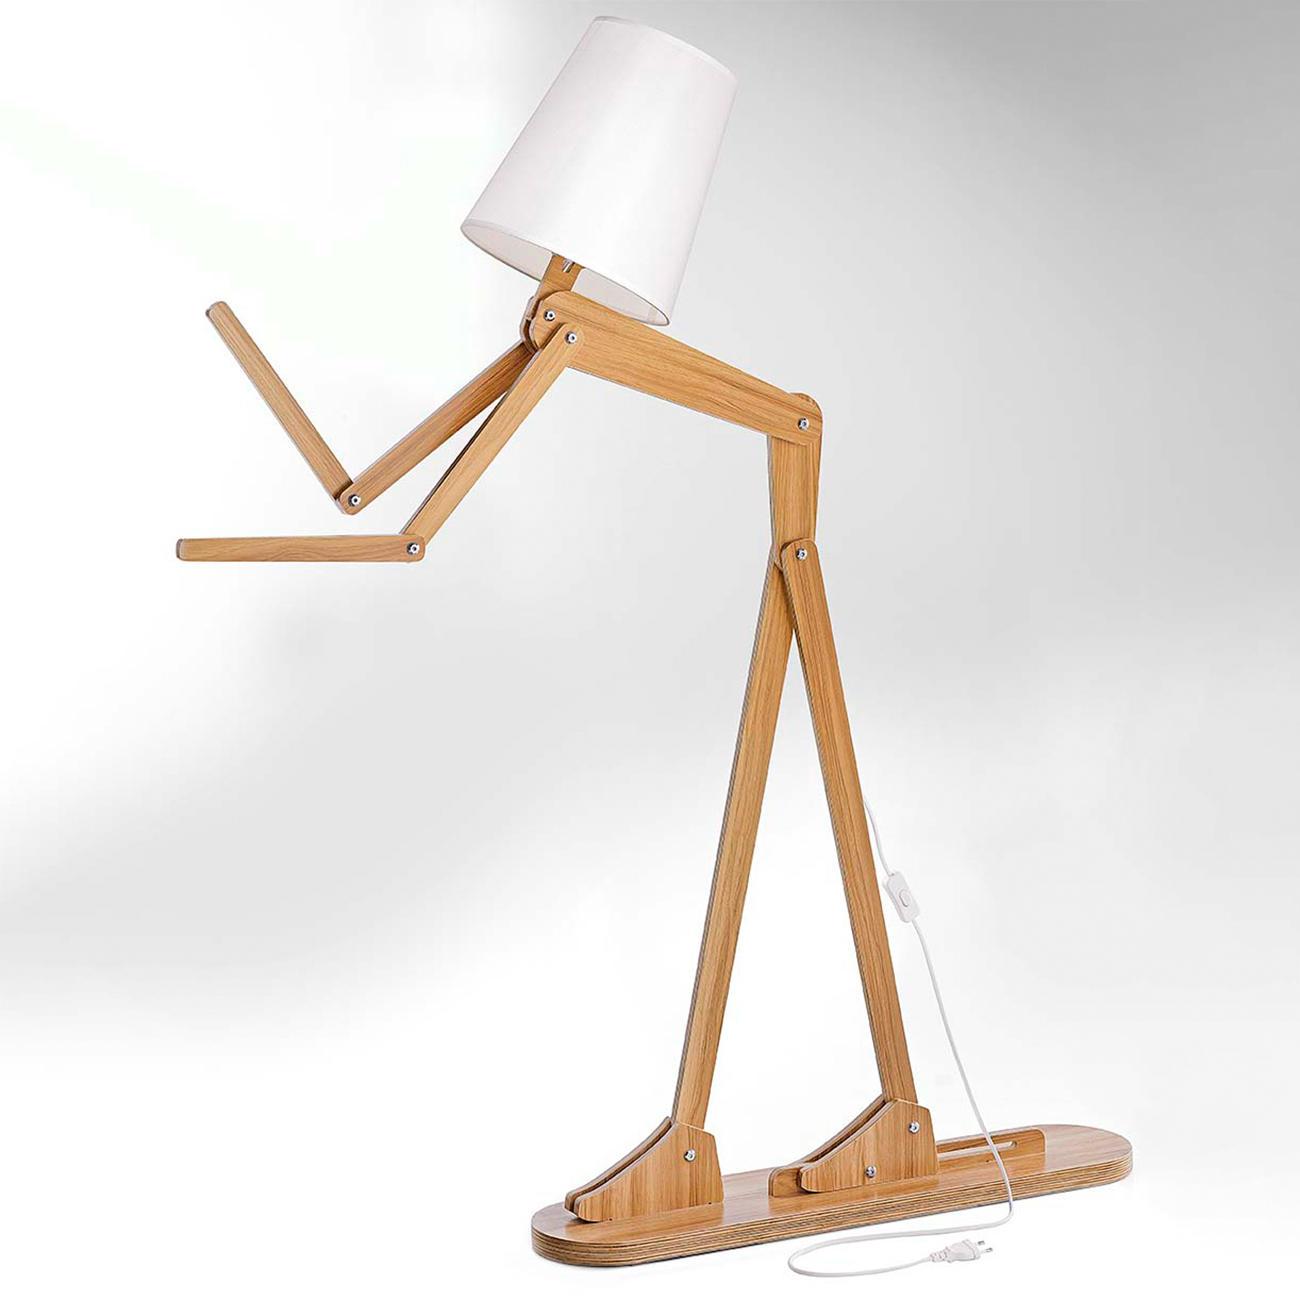 Boite Lumineuse Idee Message lampadaire « humain »